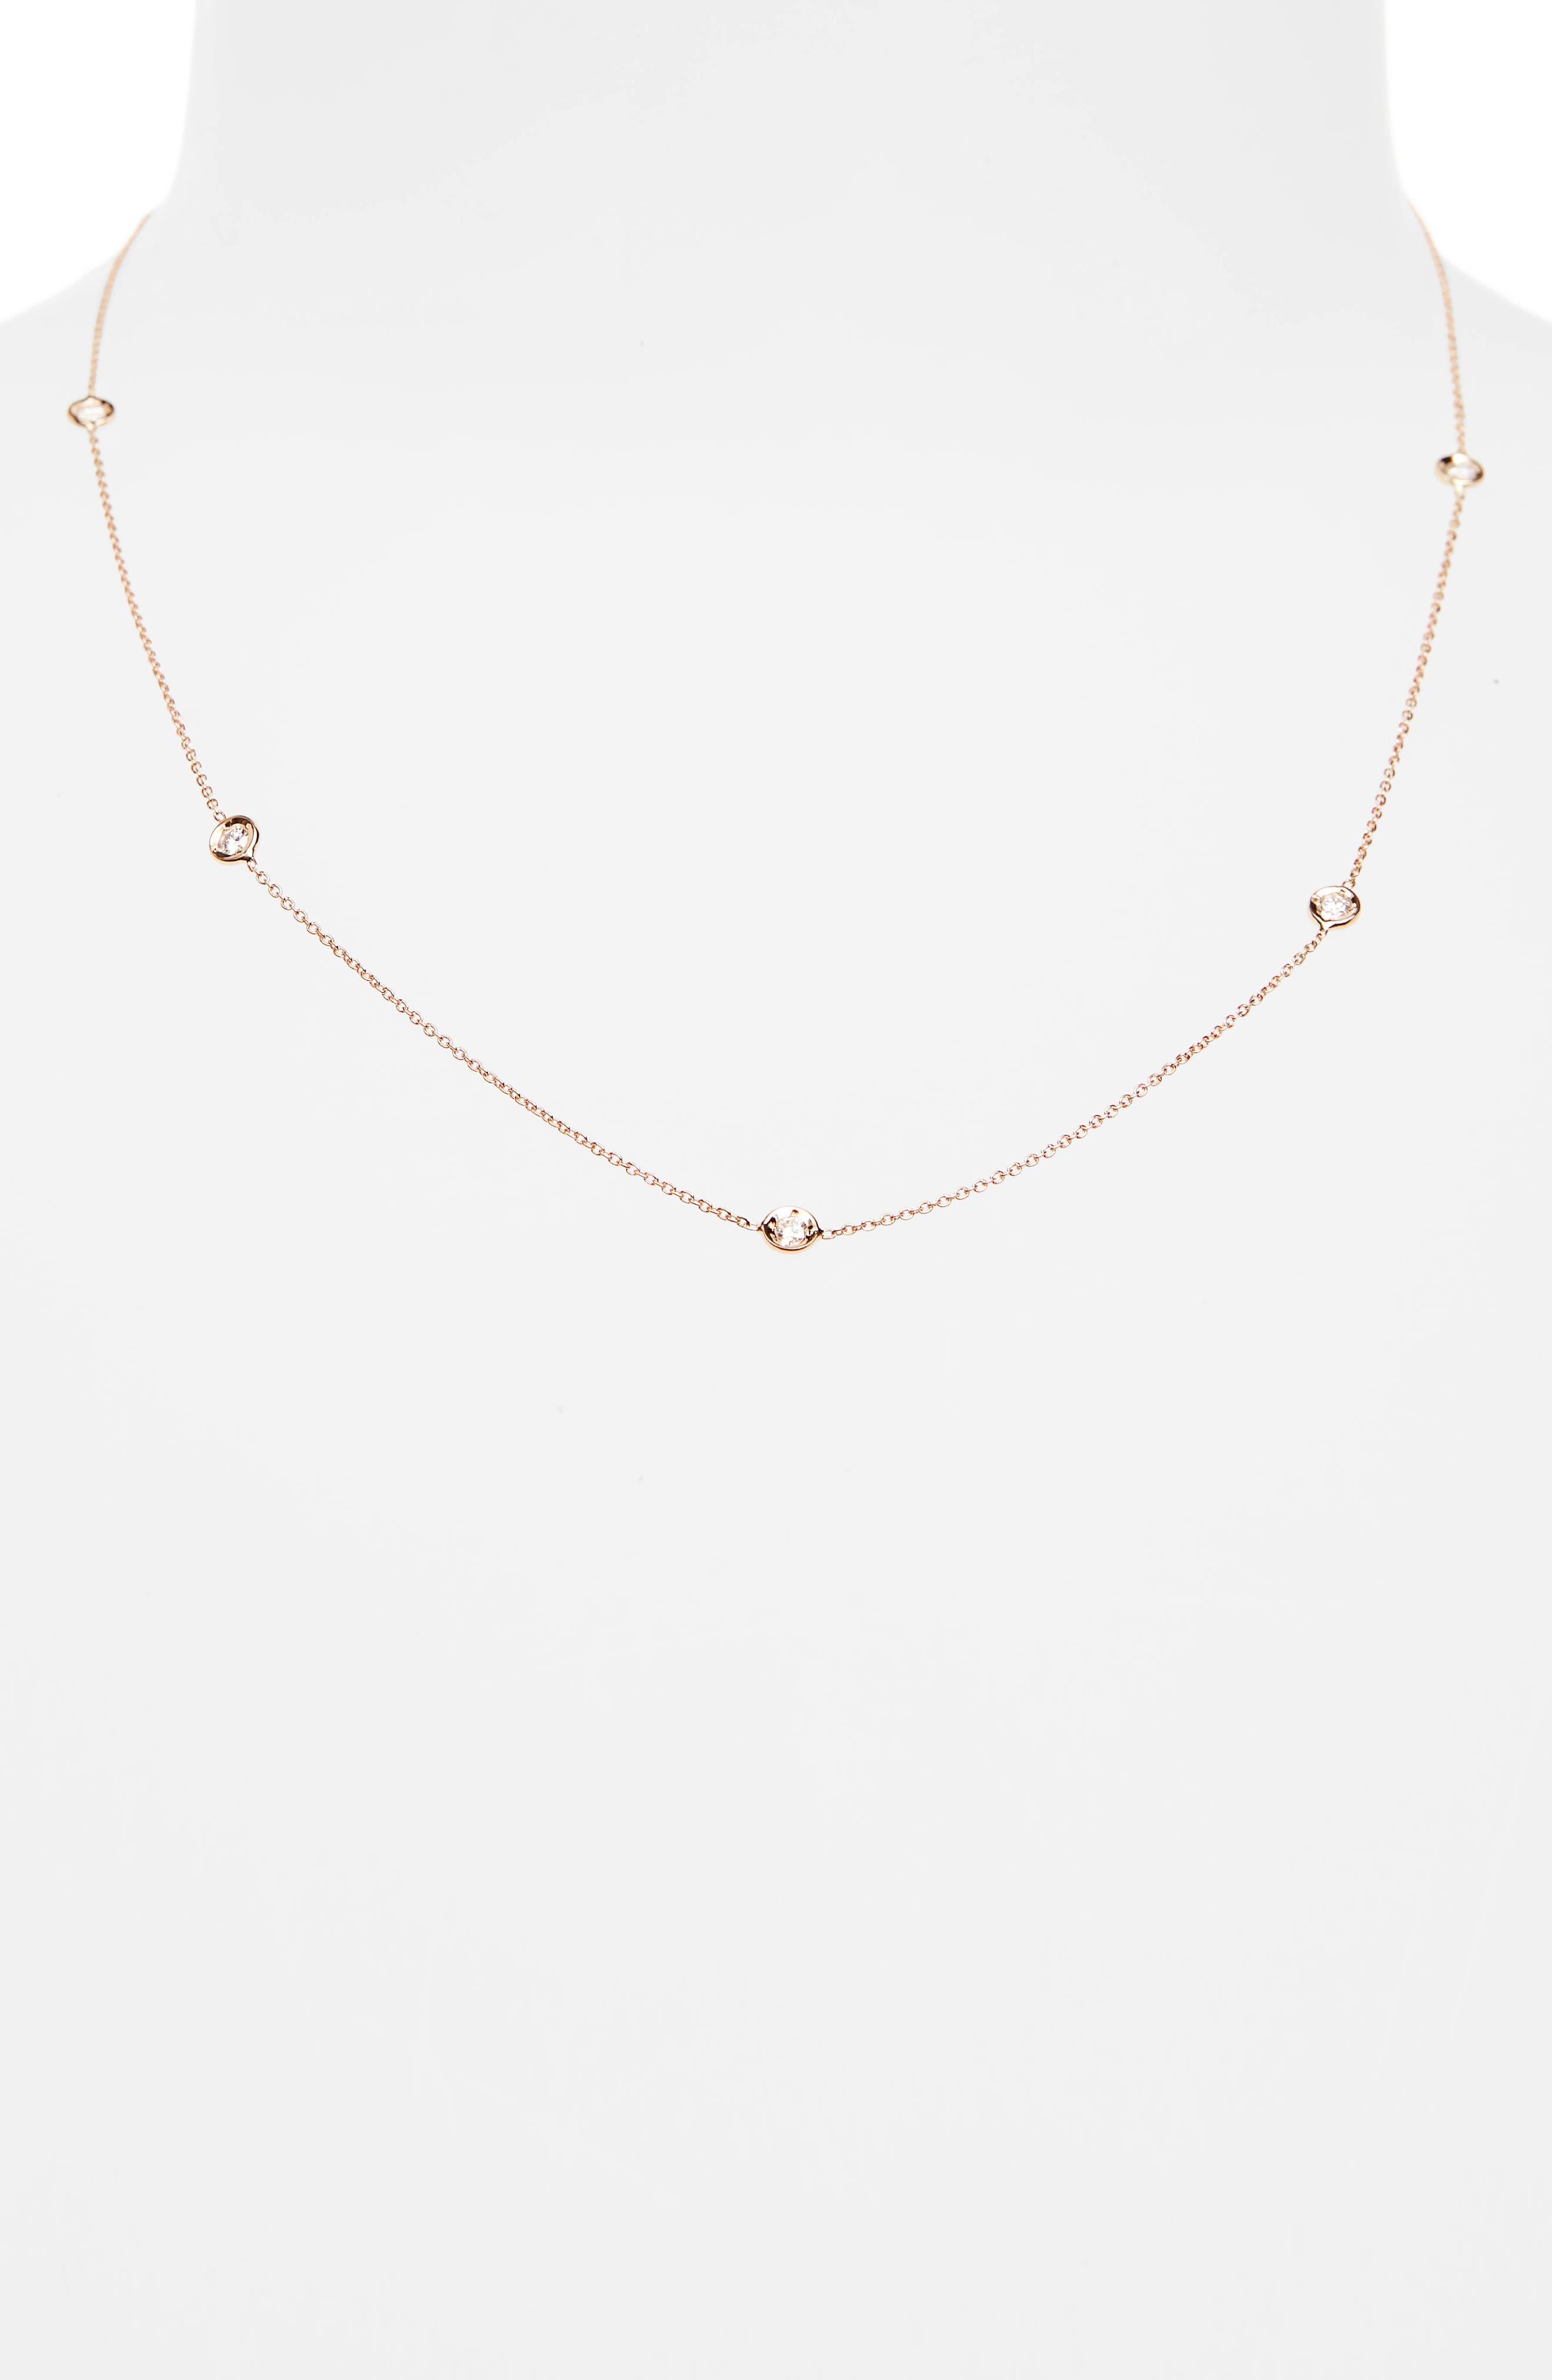 4-Station Diamond Necklace,                             Alternate thumbnail 2, color,                             Rose Gold